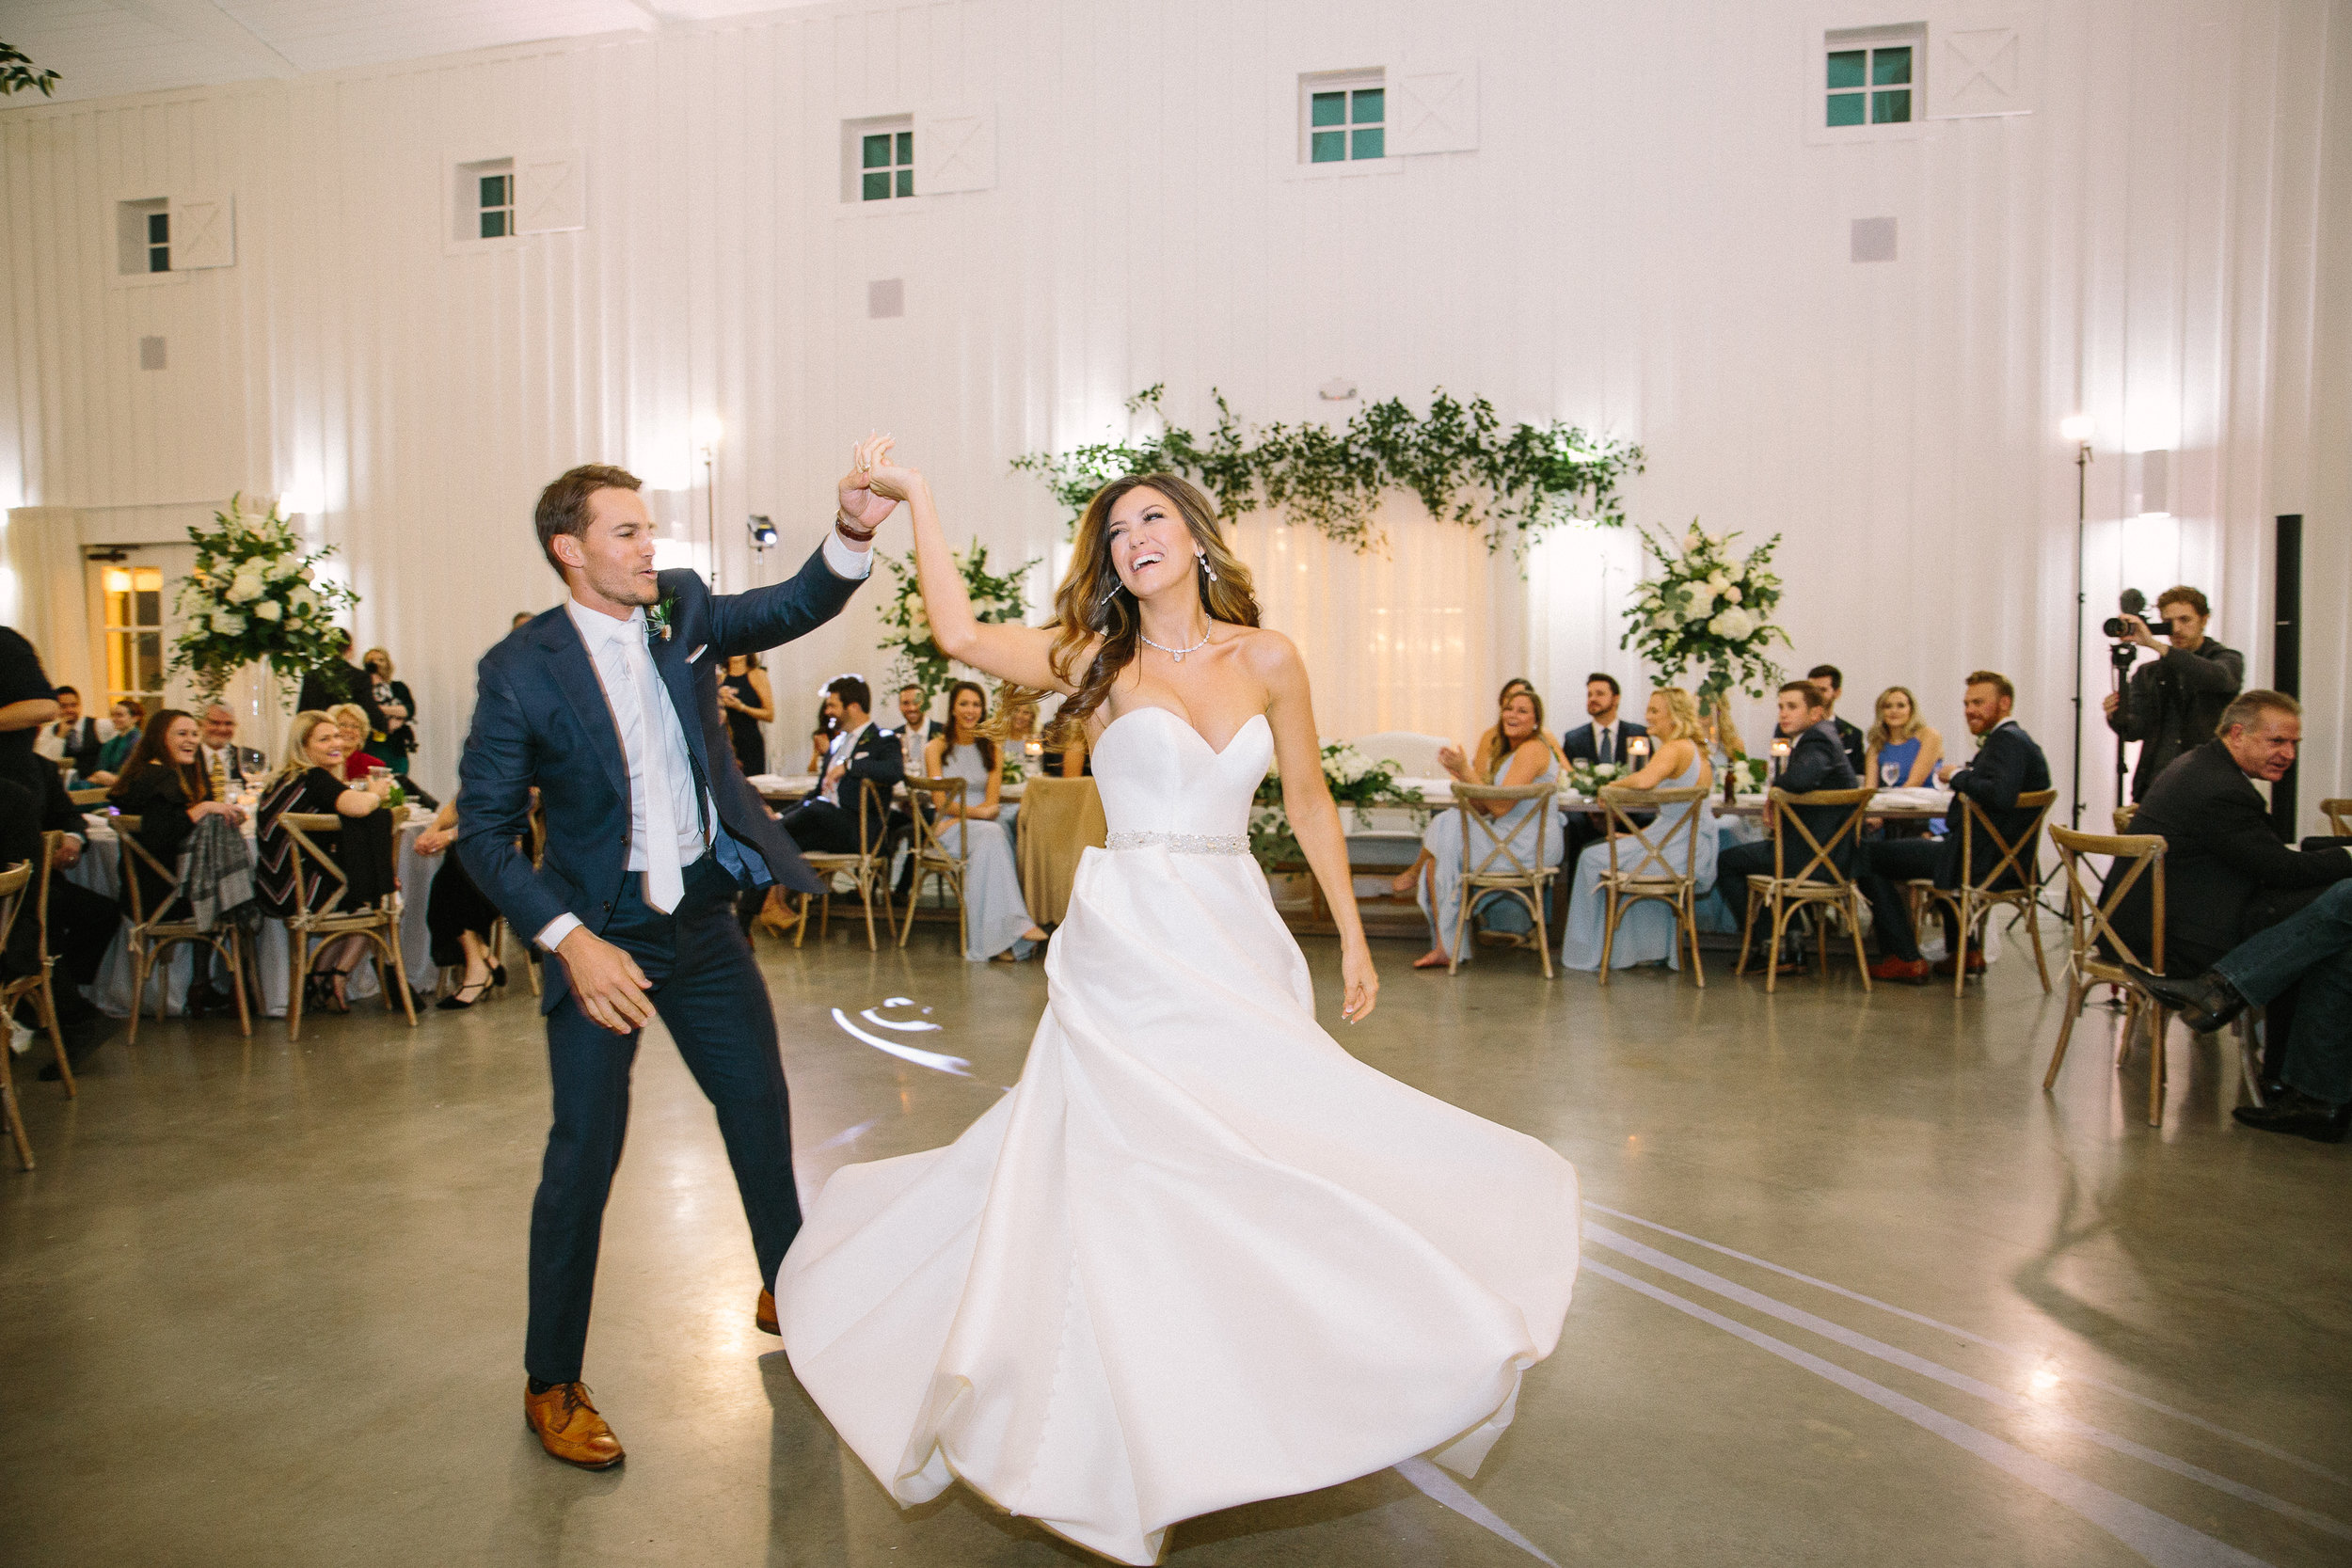 Ellen-Ashton-Photograph-Dallas-Wedding-Photographers--The-Farmhouse-Weddings-Wed-and-Prosper-Weddings1807.jpg